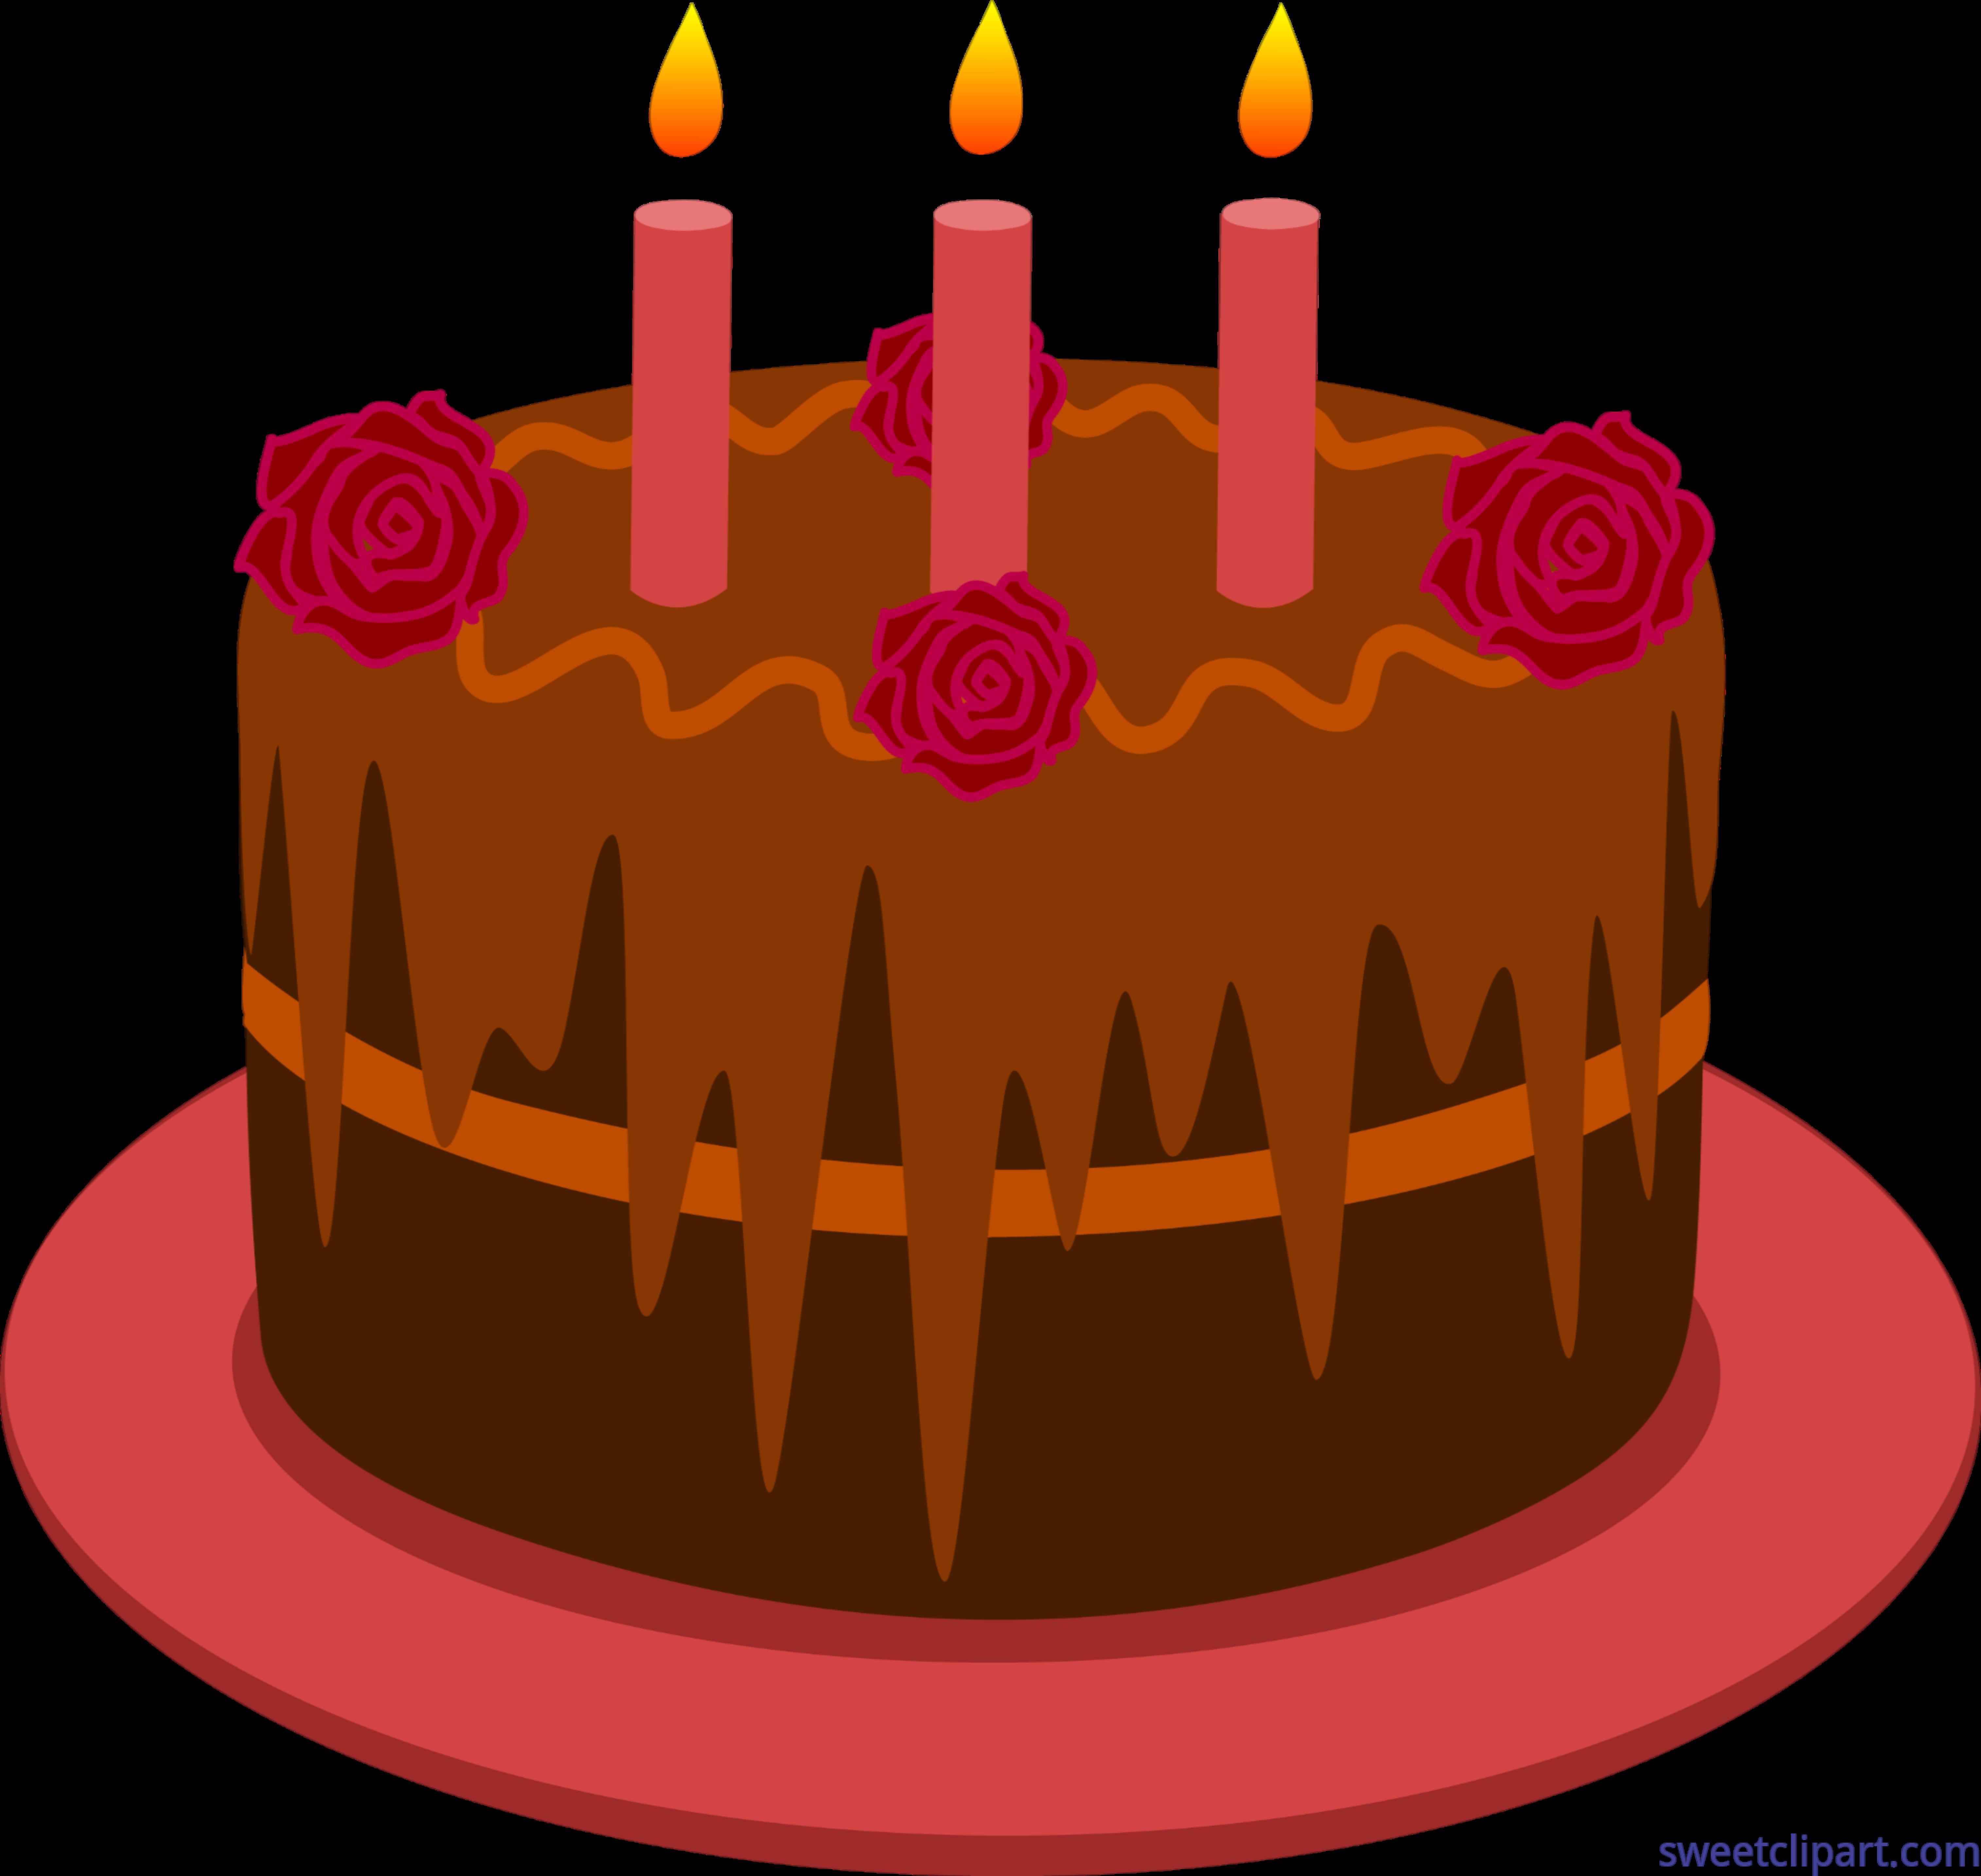 image free download Cake clip art sweet. Chocolate transparent birthday